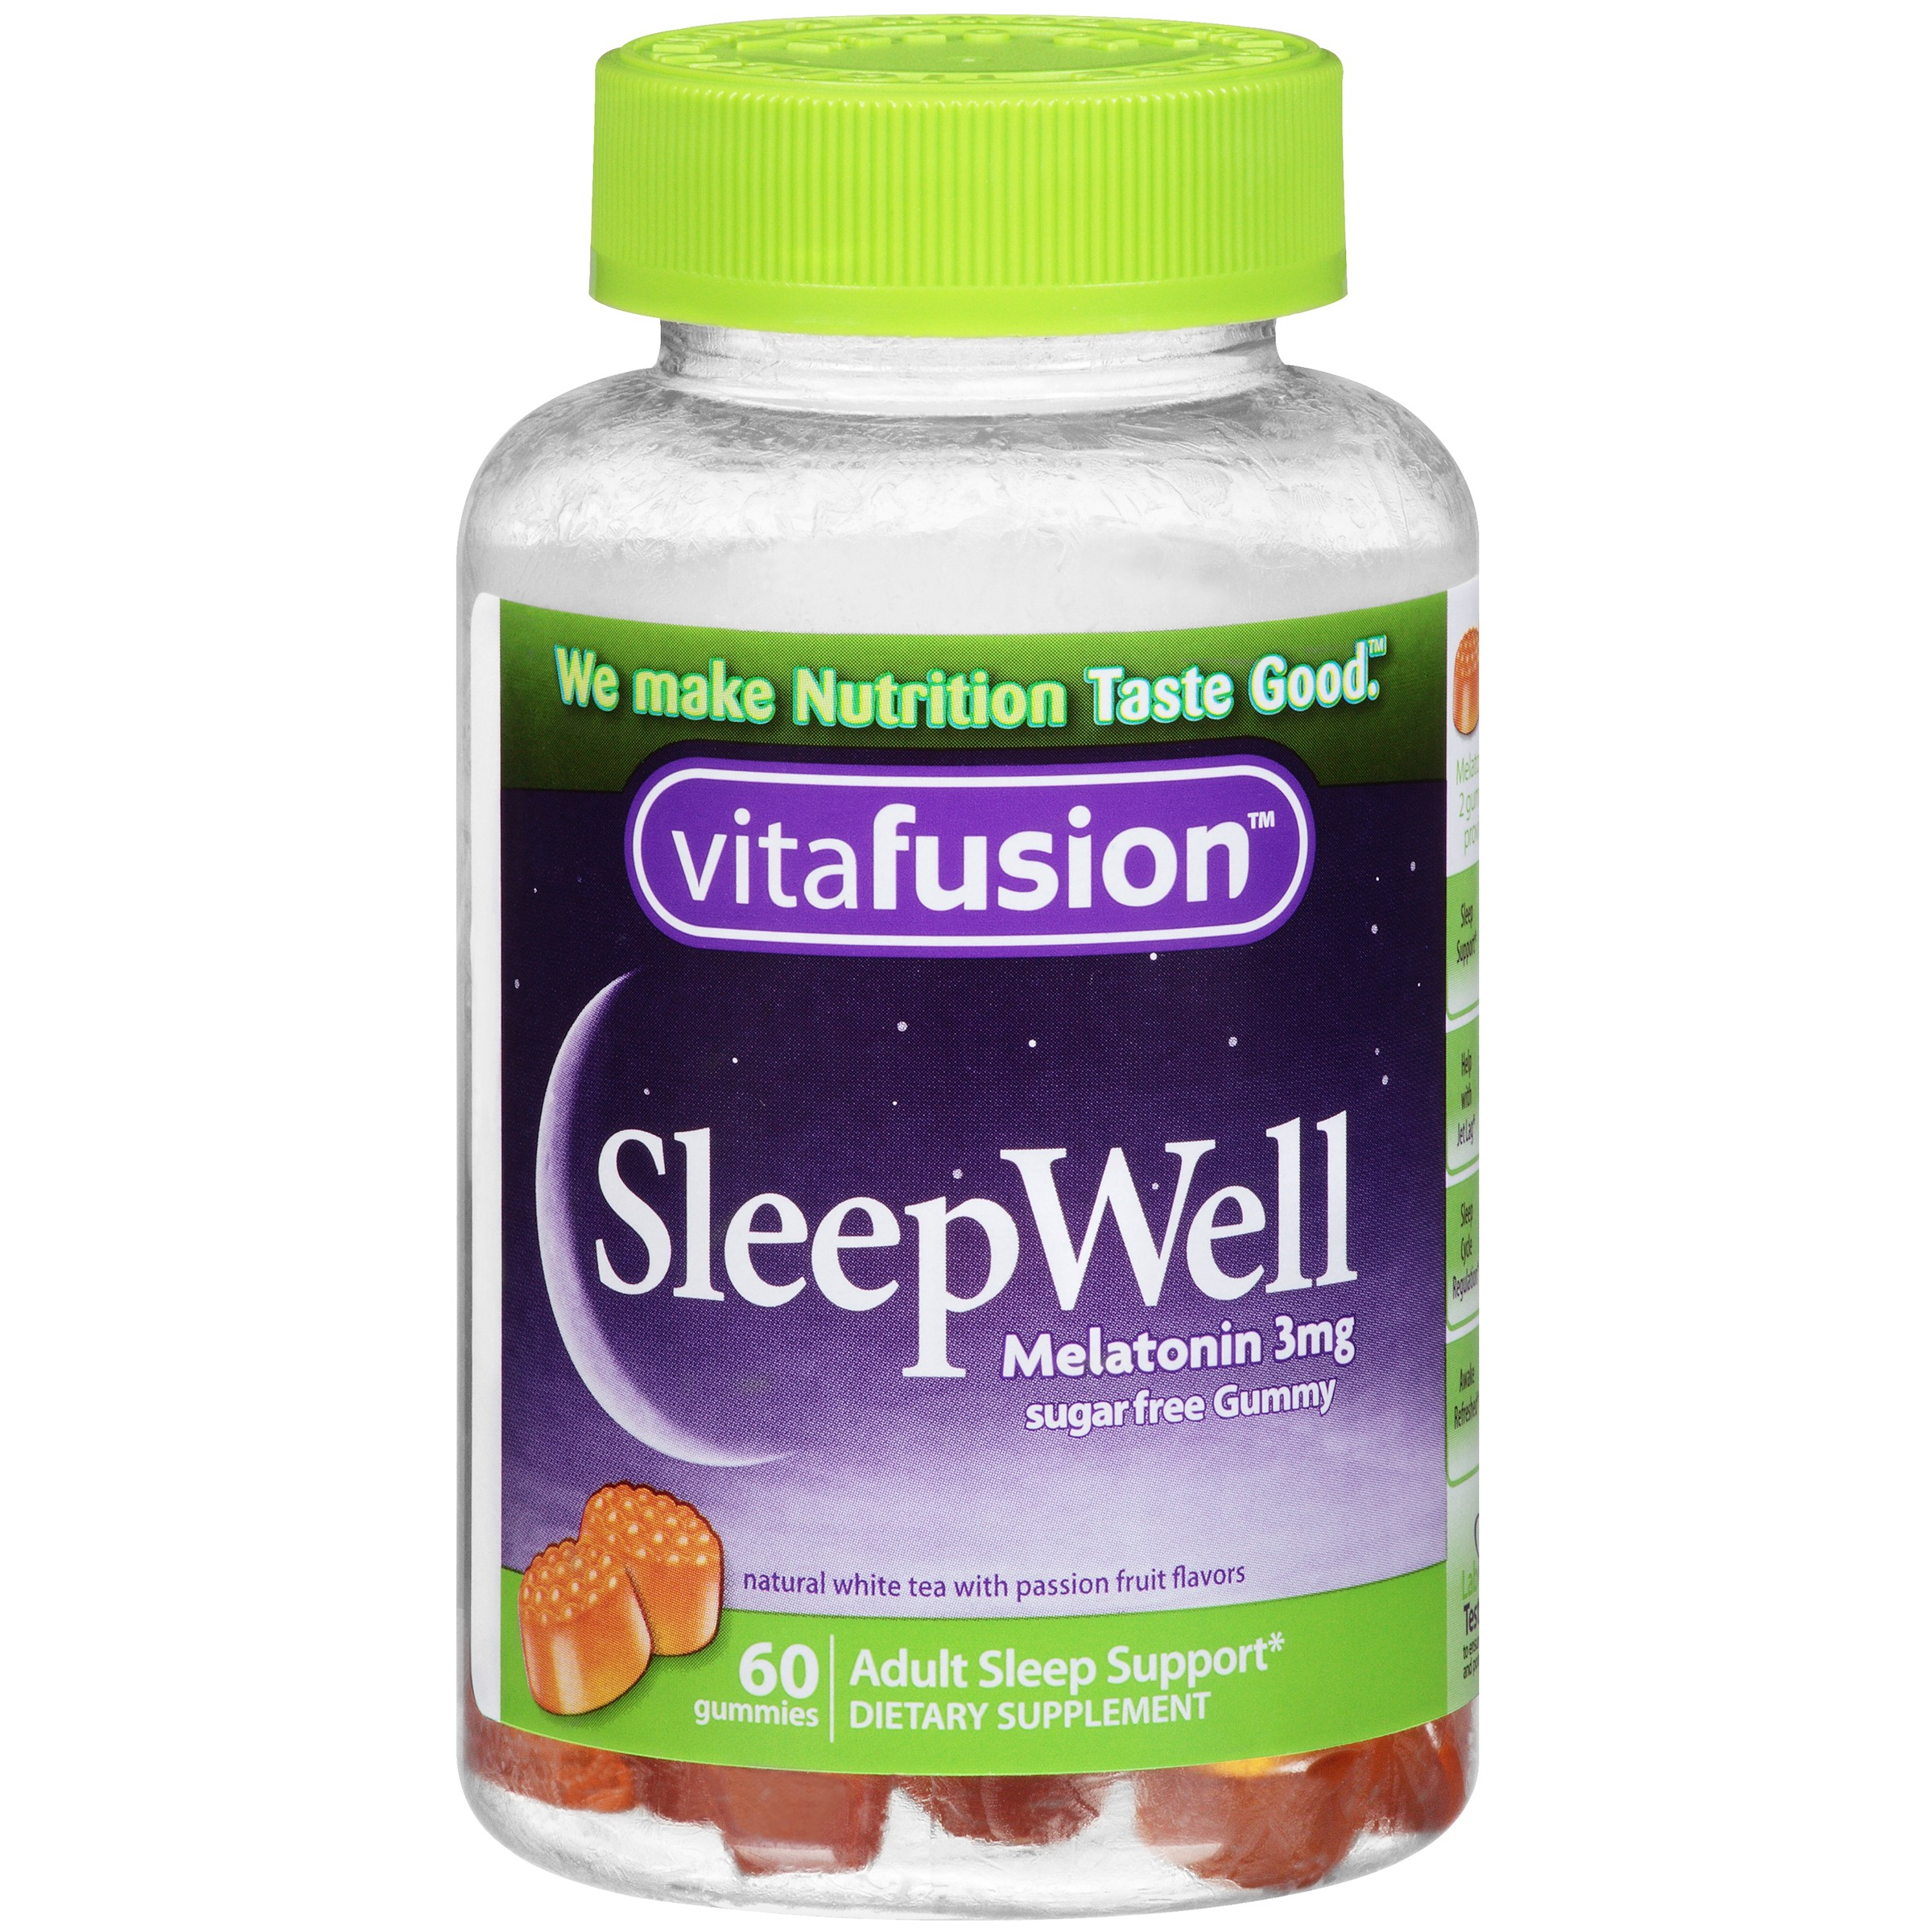 Vitafusion SleepWell Gummy Sleep Support for Adults, 60 count